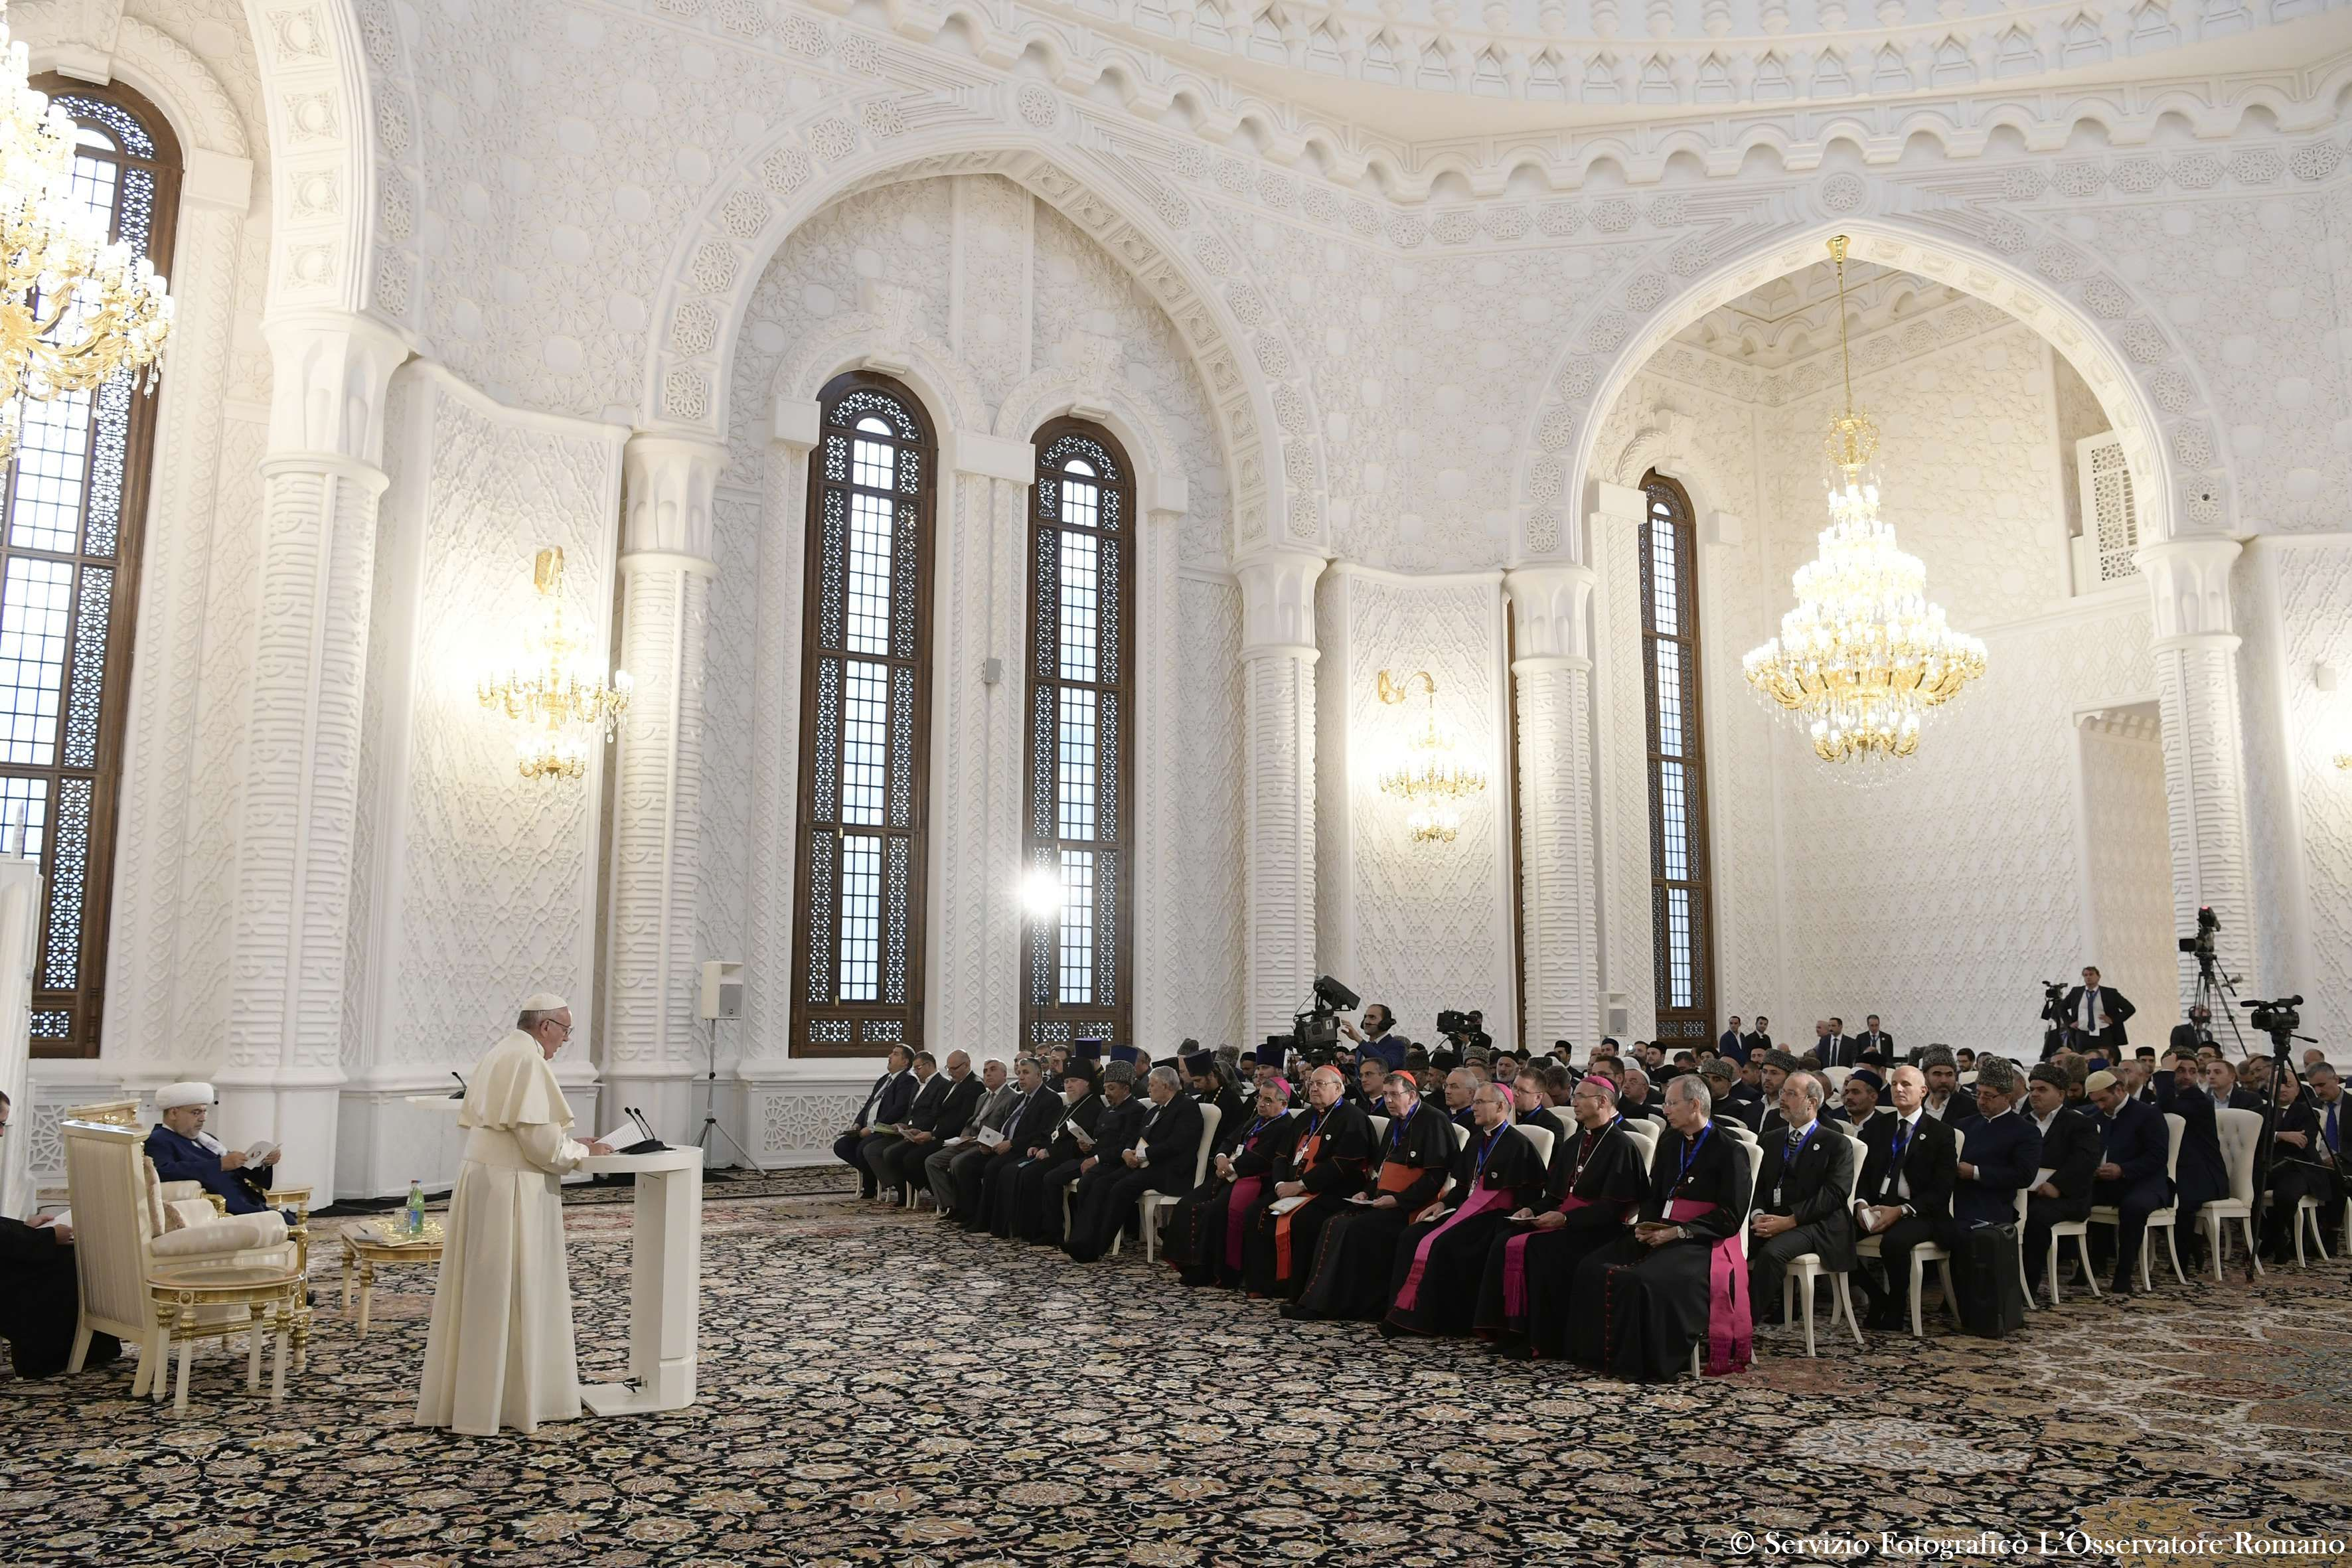 Rencontre interreligieuse à la mosquée de Bakou, Azerbaidjan @ L'Osservatore Romano